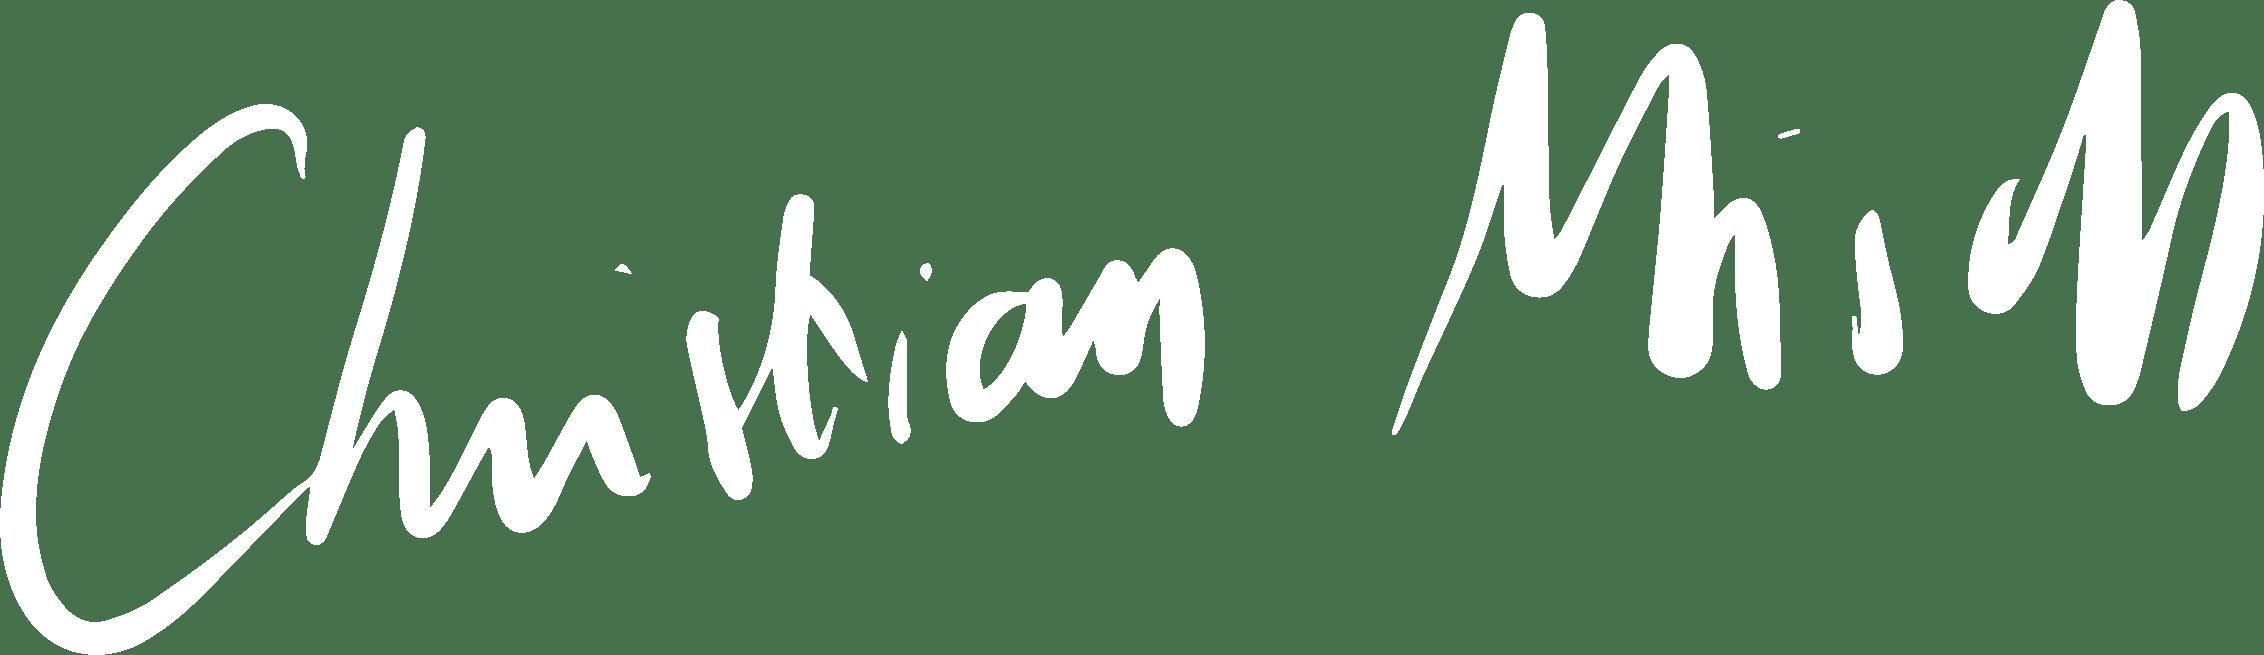 Firma Christian White